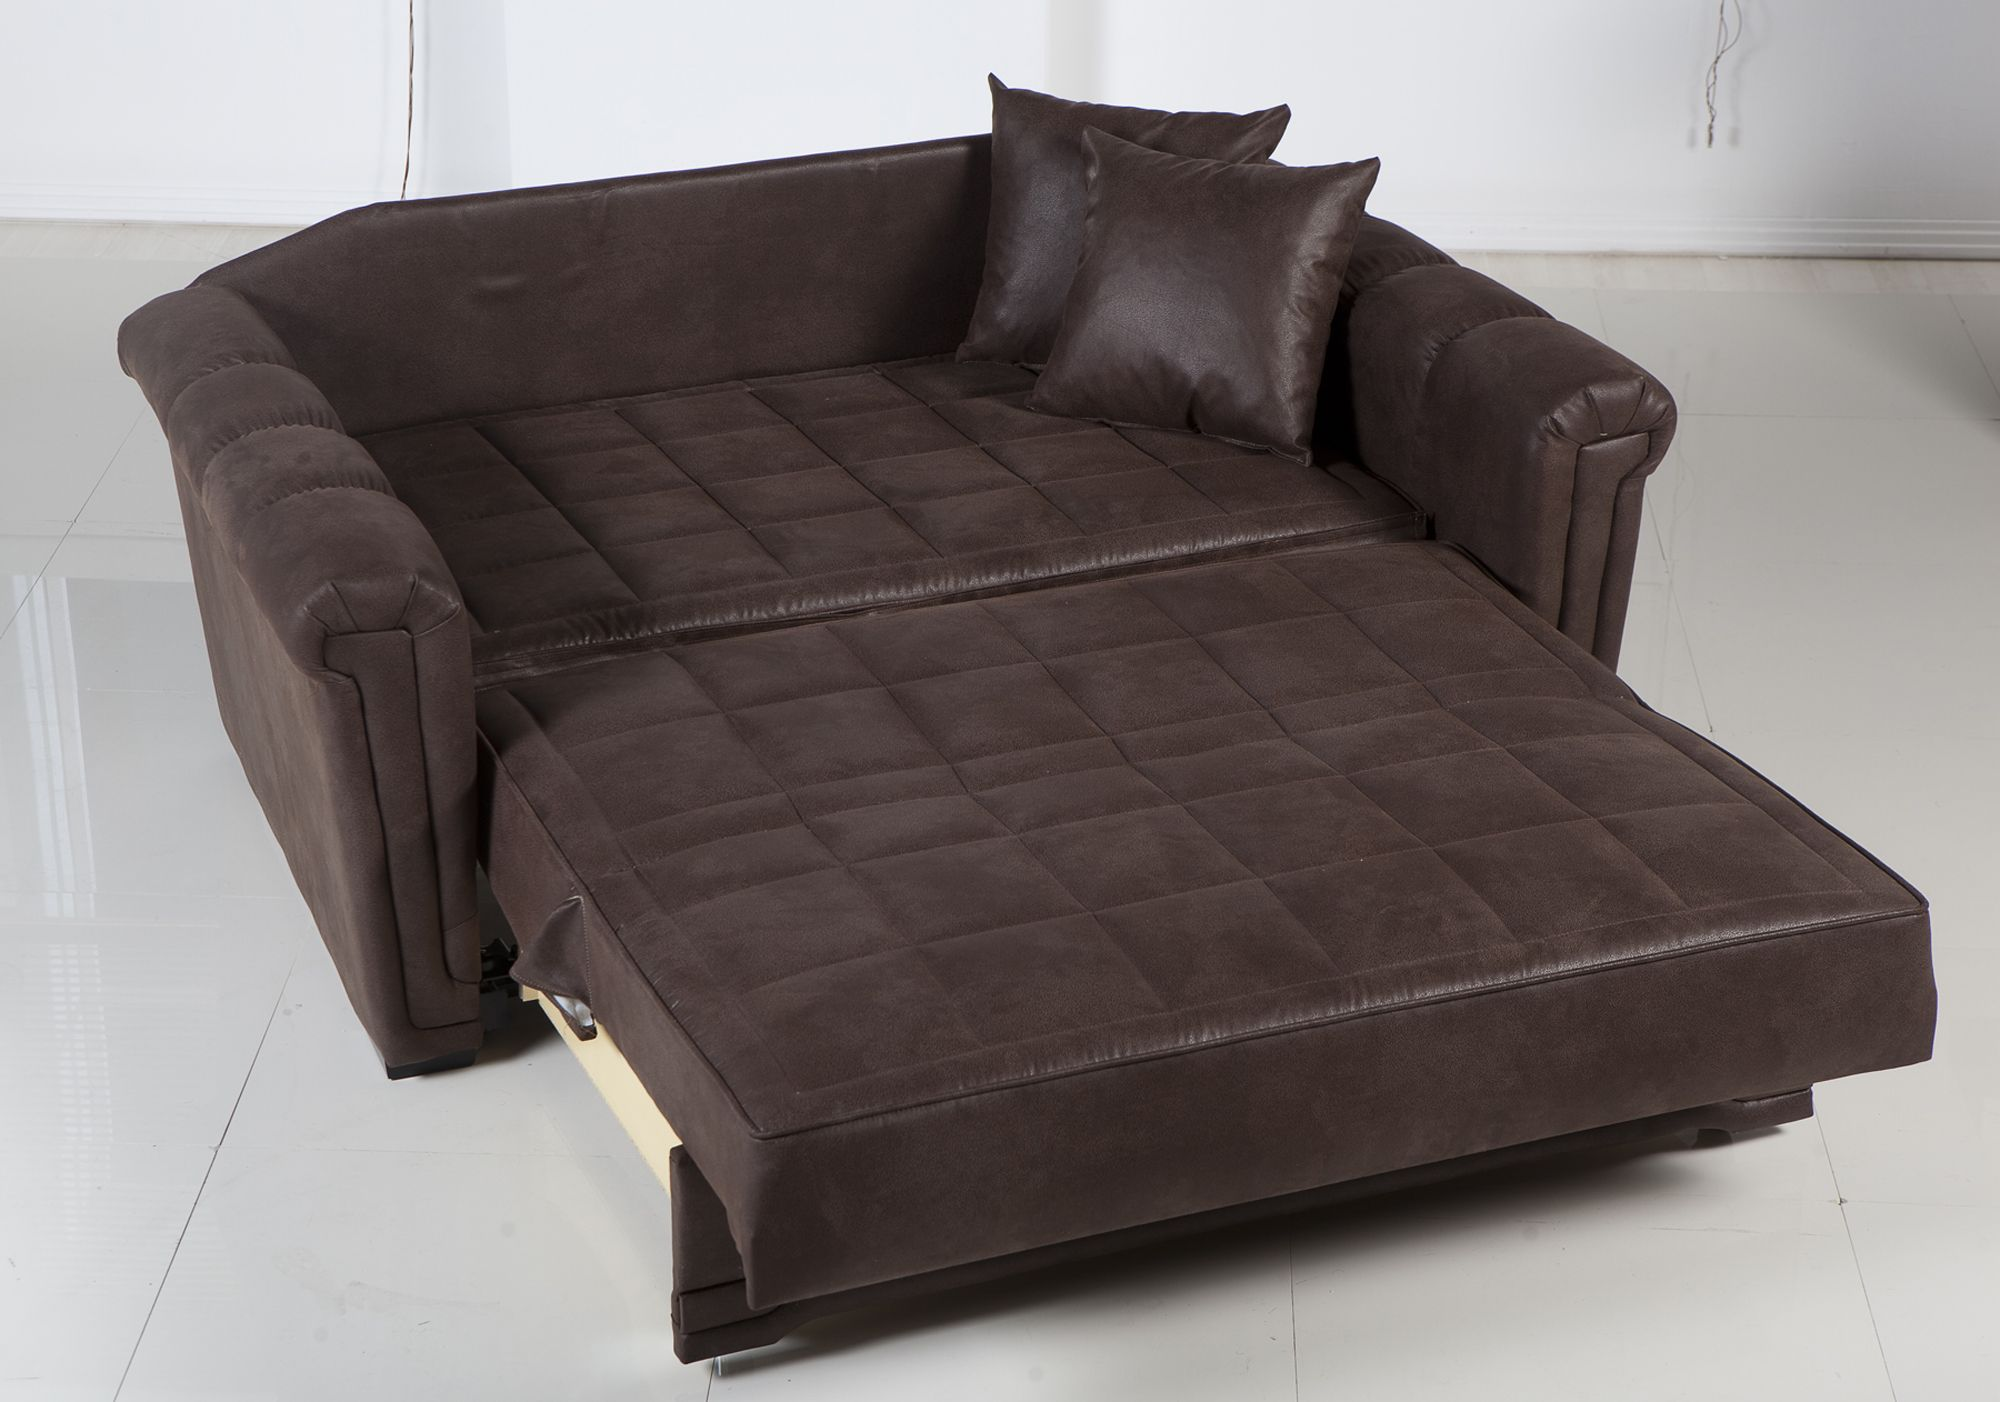 Best Kitchen Gallery: Cool Loveseat Sleeper Bed Good Loveseat Sleeper Bed 85 Modern Sofa of Loveseat Bed  on rachelxblog.com